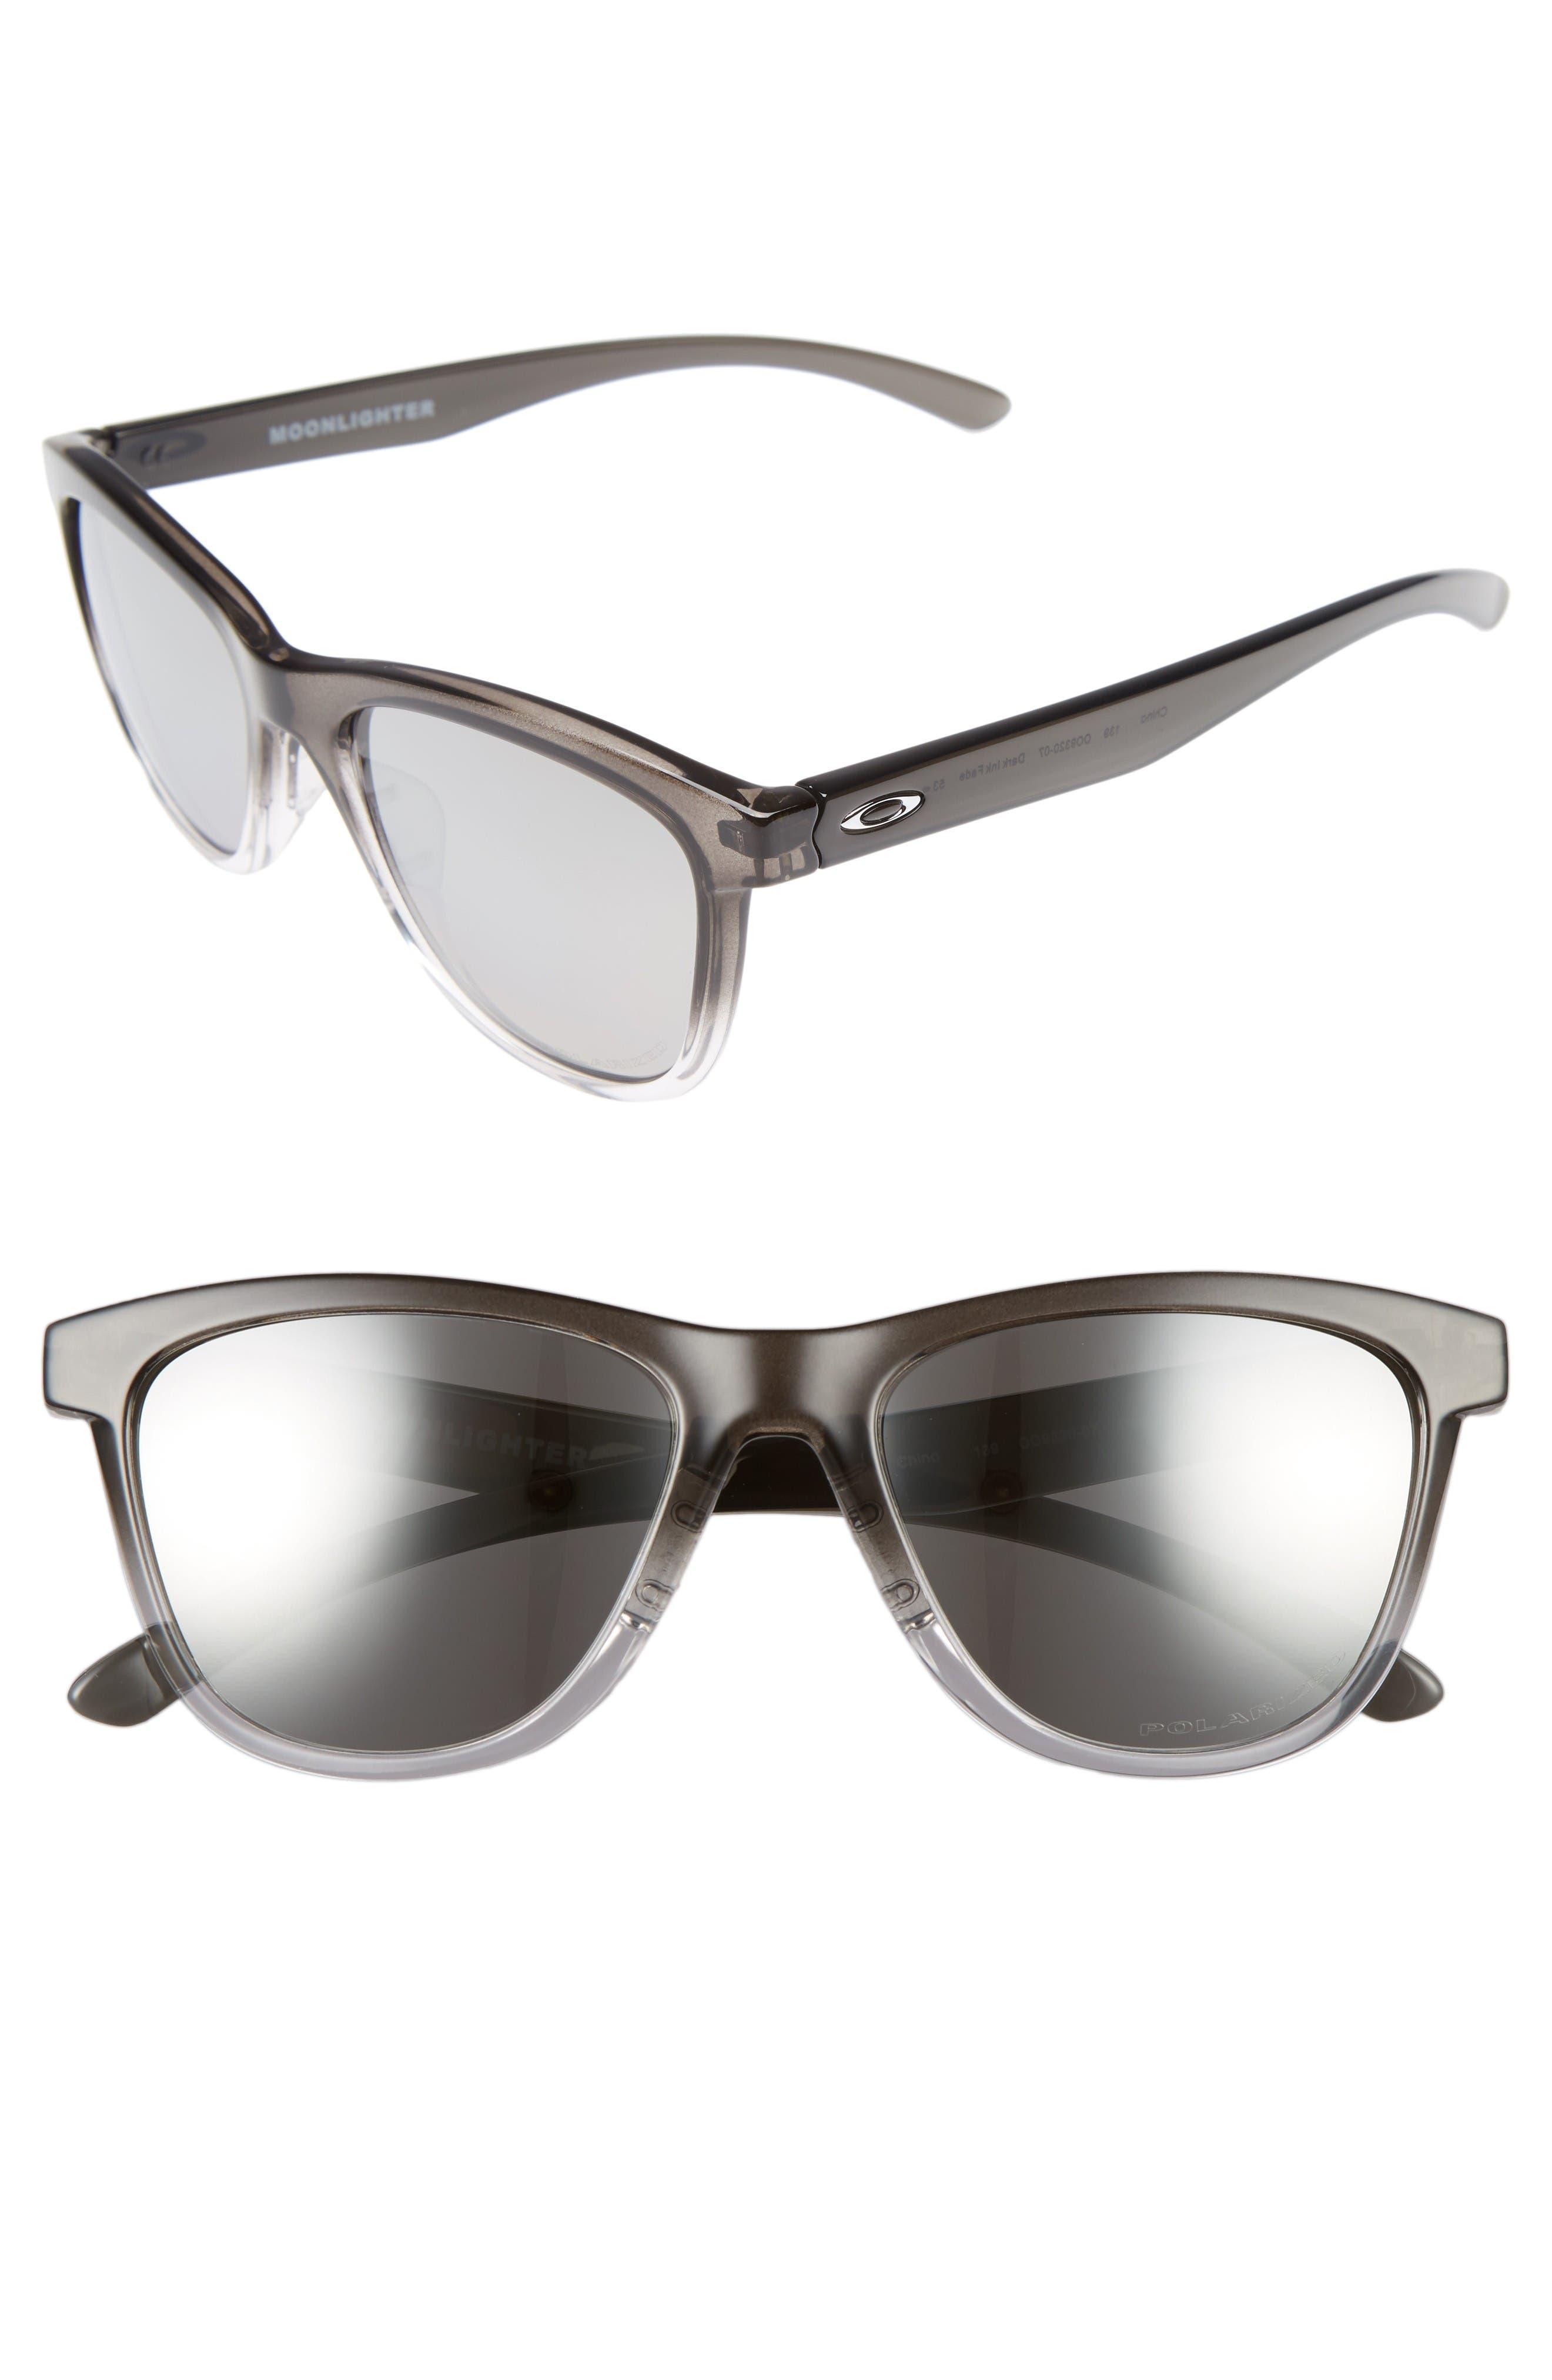 Oakley Moonlighter 53mm Polarized Sunglasses